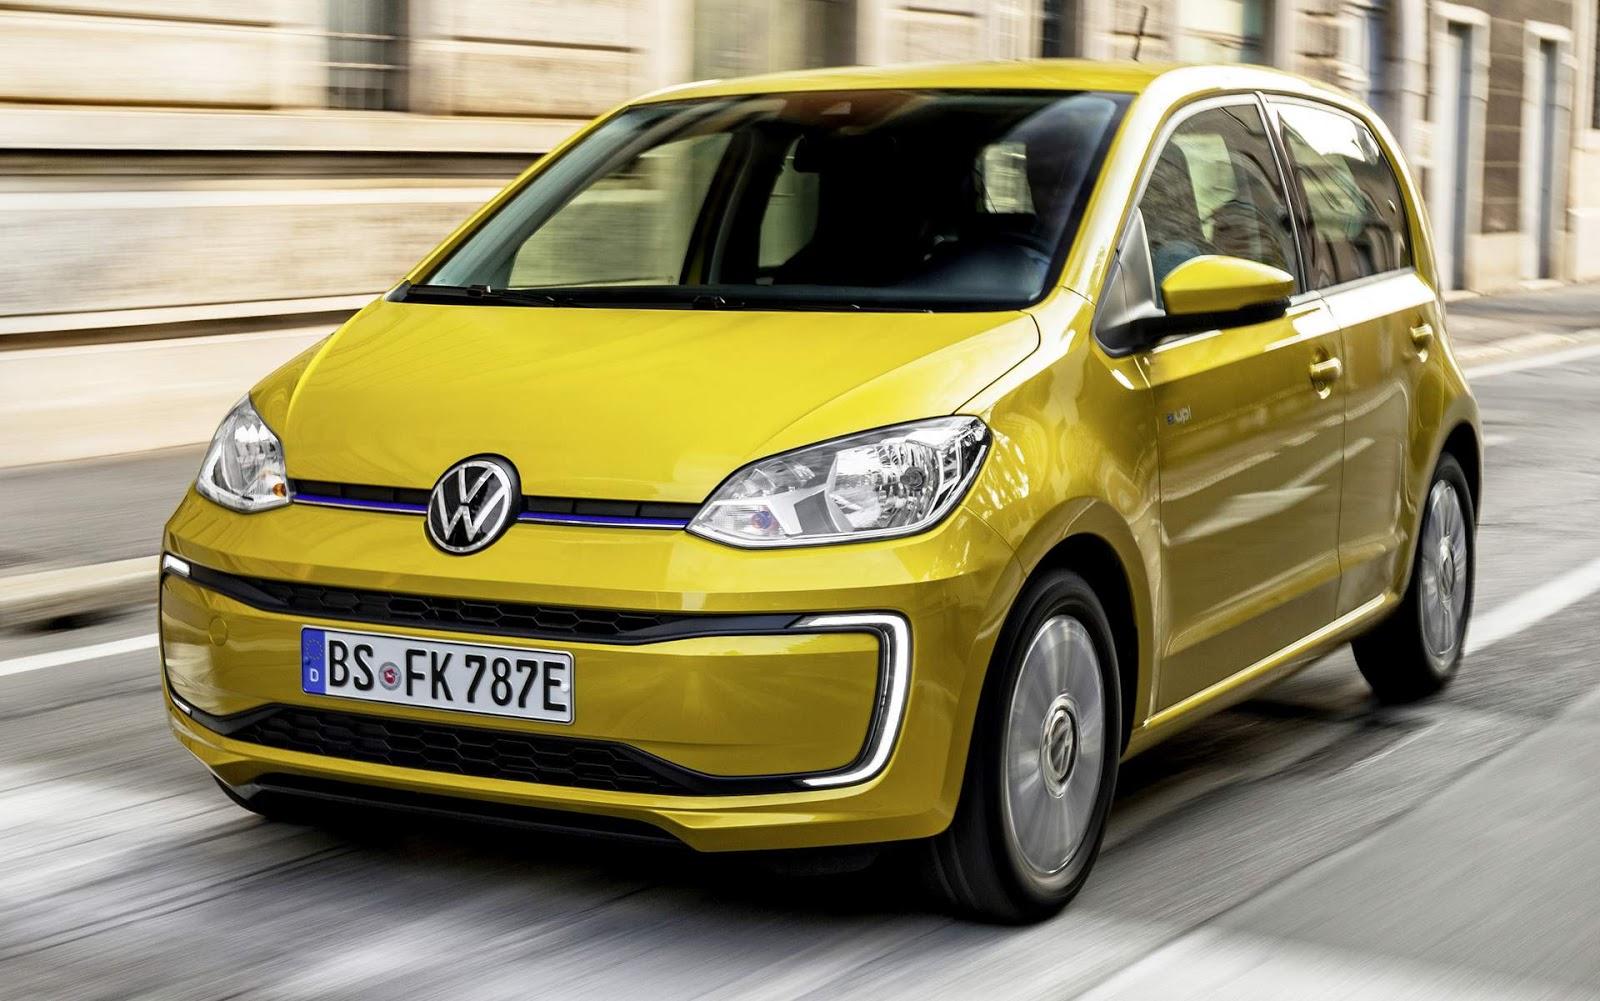 Grupo Volkswagen espera lucro de US$ 13 bilhões no 1º semestre de 2021